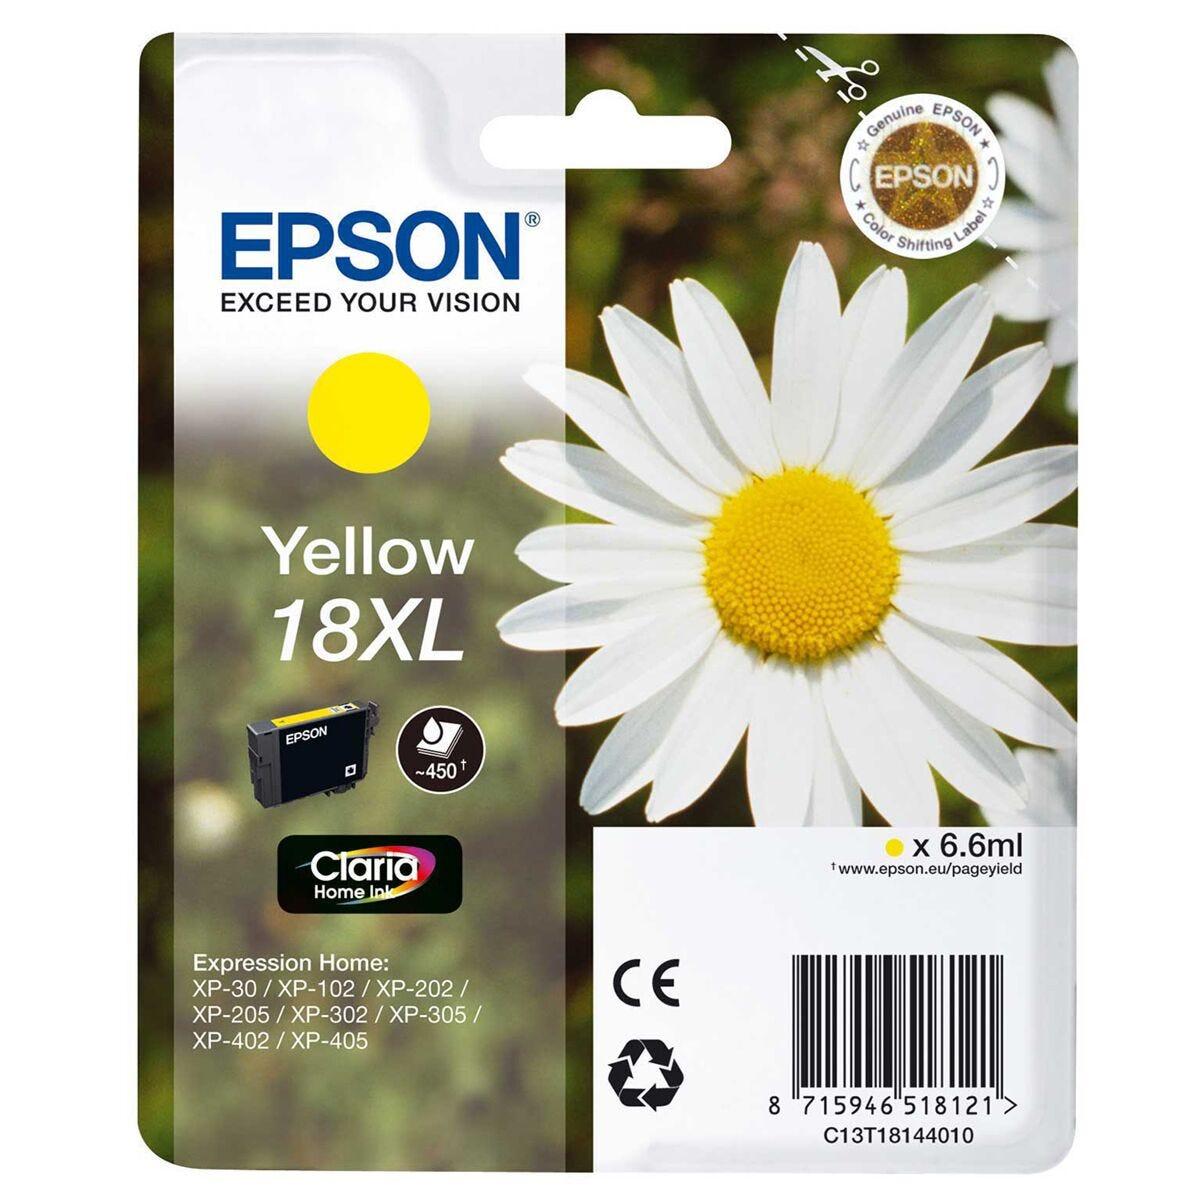 Epson Daisy XL Ink Cartridge C13T18144010